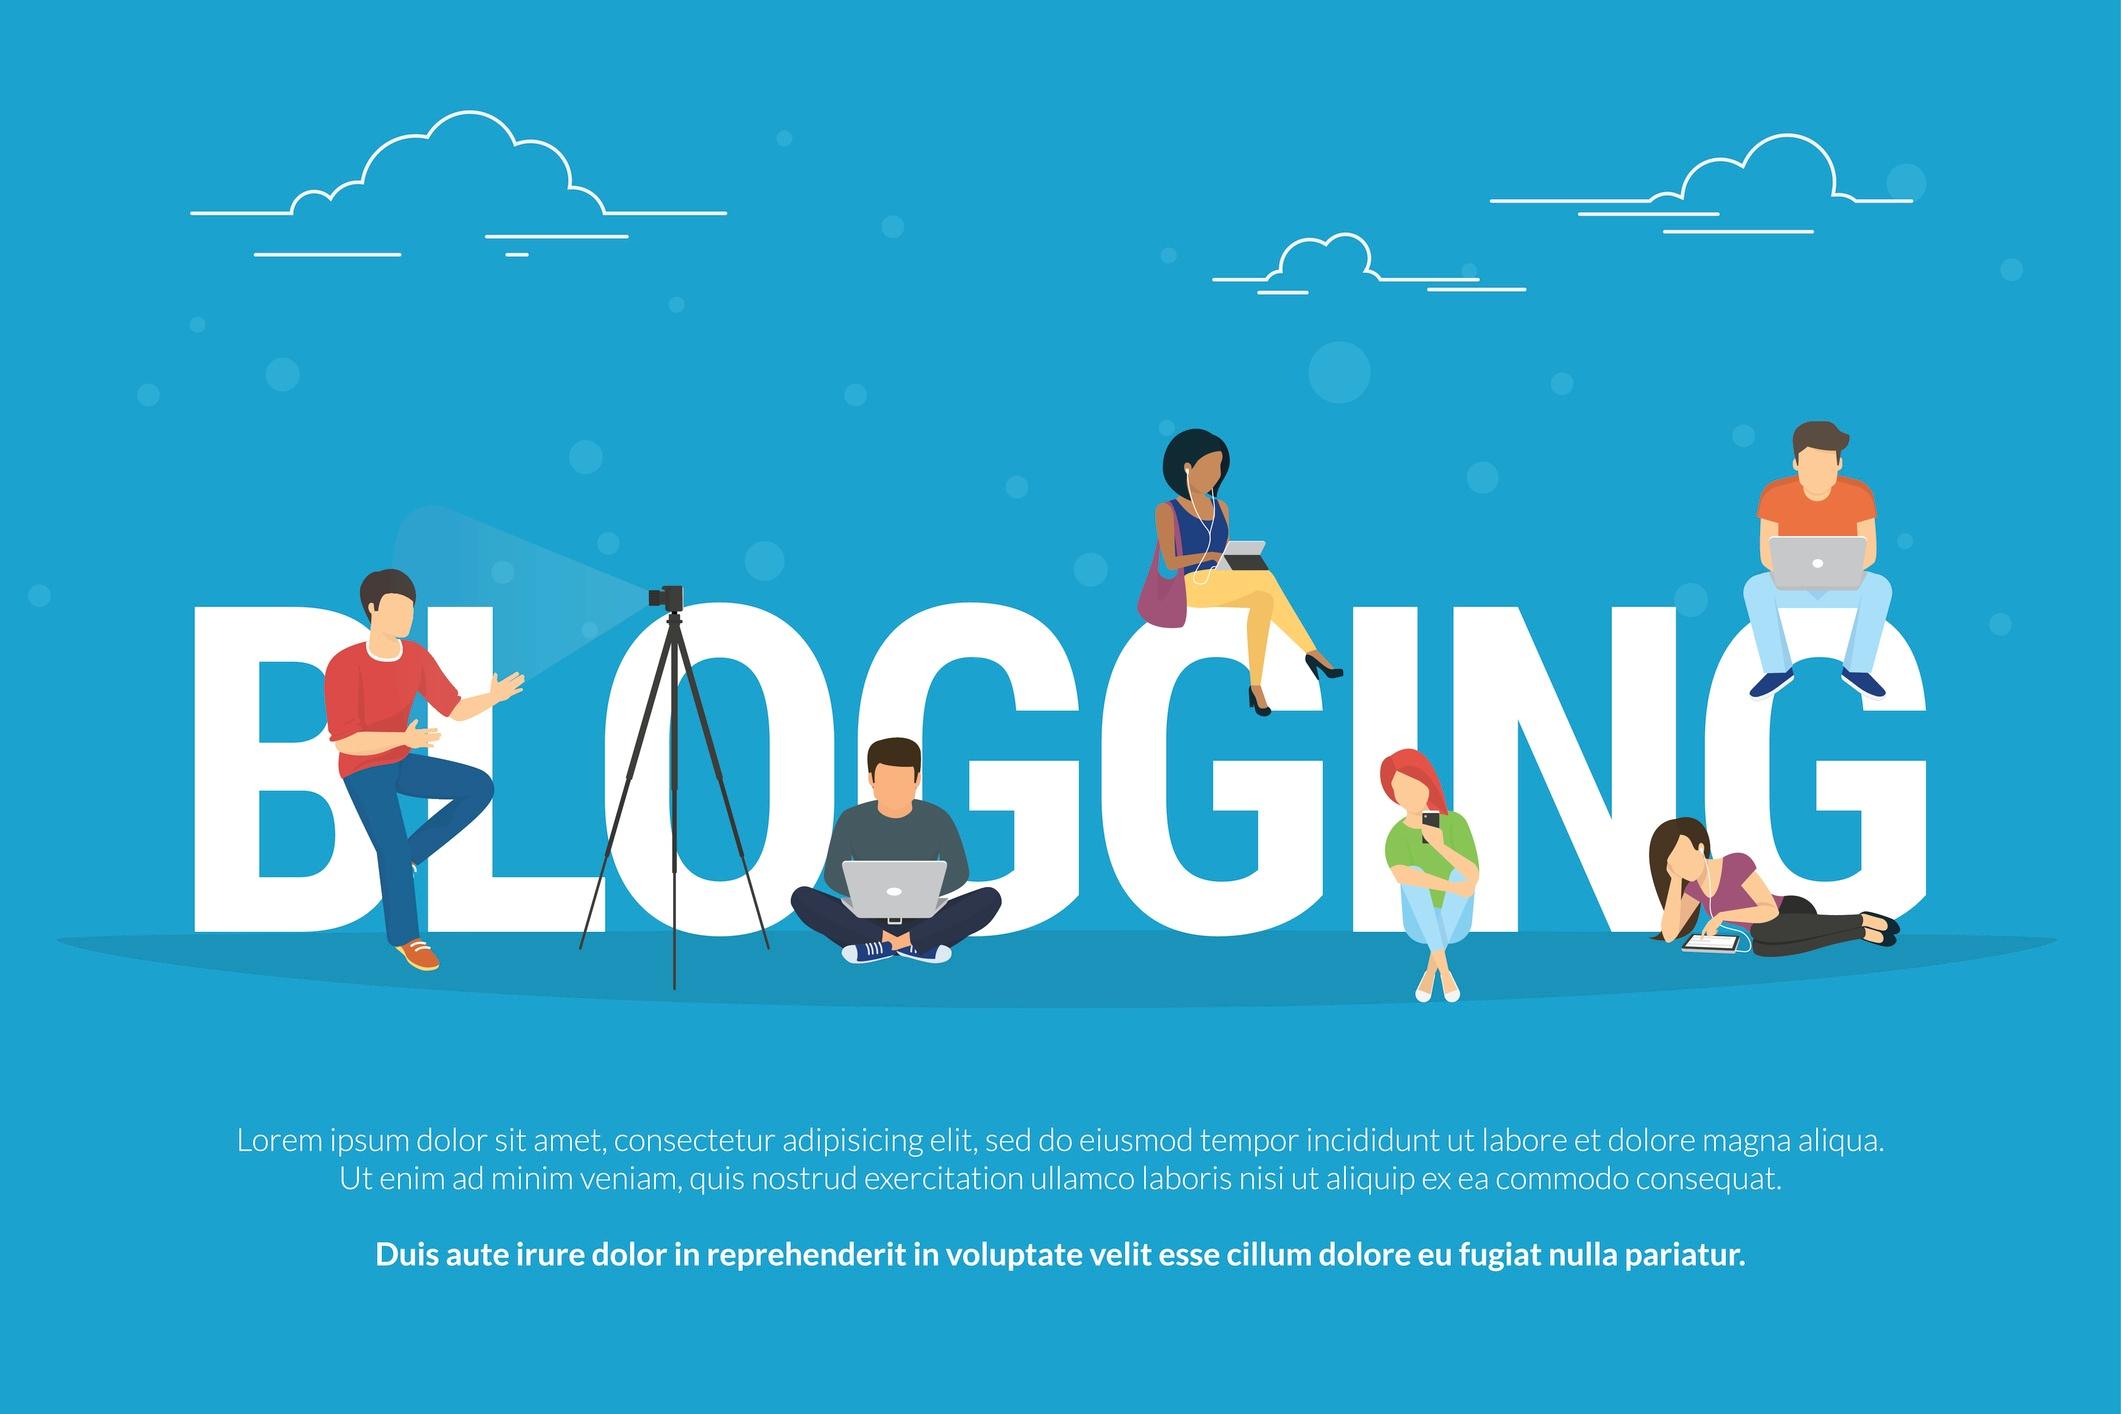 benefits-of-blogging-living-proof-it-works.jpg